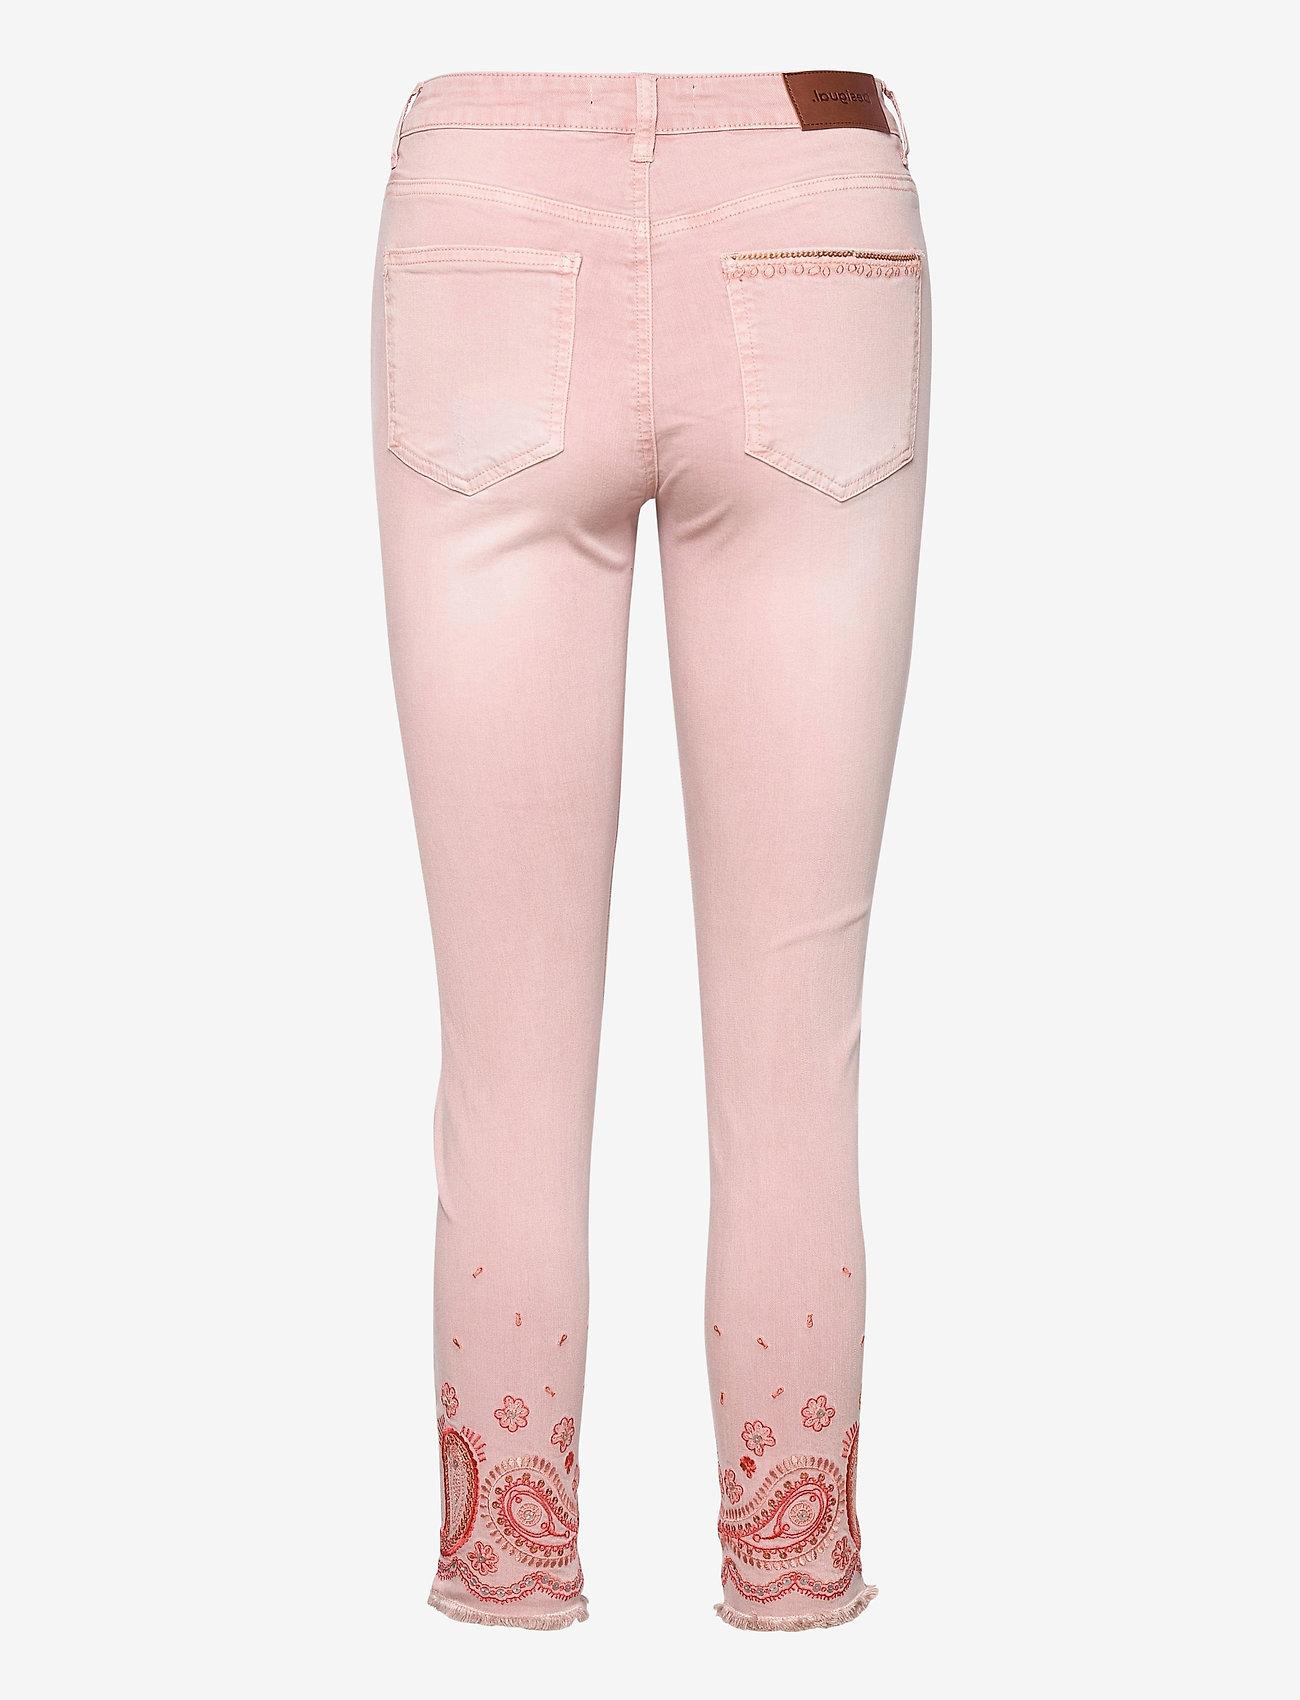 Desigual - PANT ANKLE PAISLE - rosa palo - 1